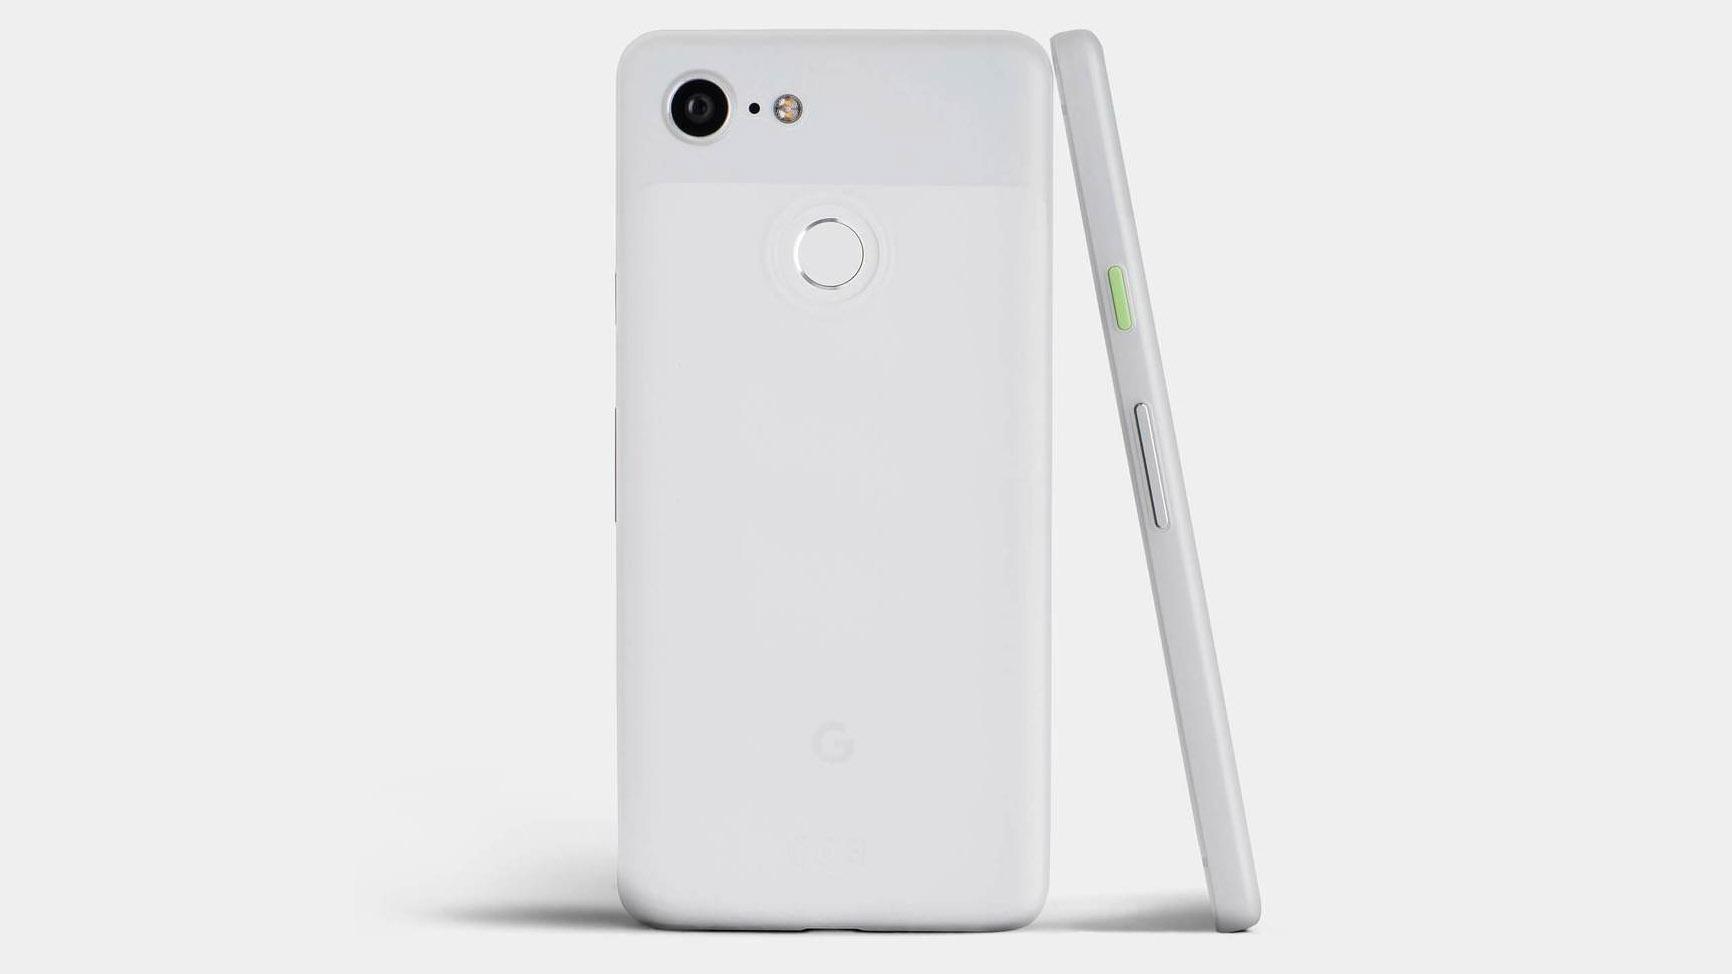 Google Pixel 3 Depicted Again In Premature Case Listing